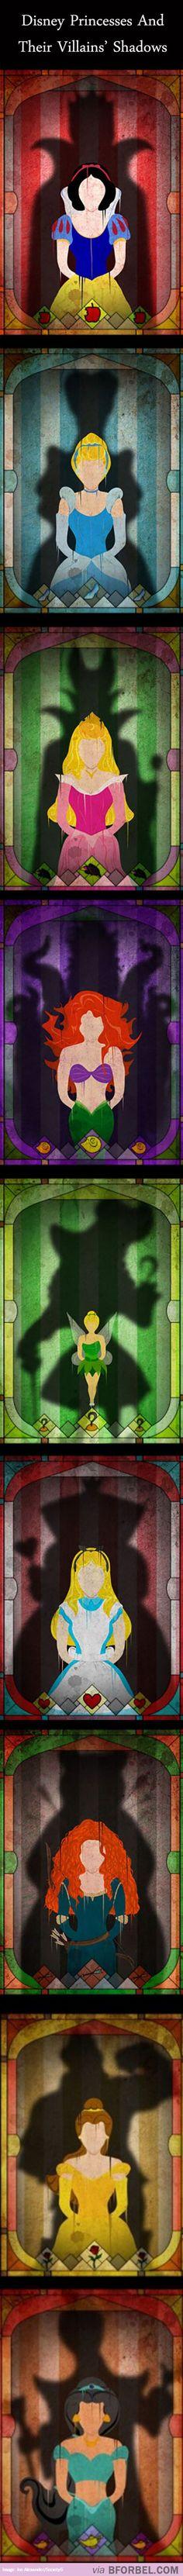 Disney princesses in their villains silhouettes